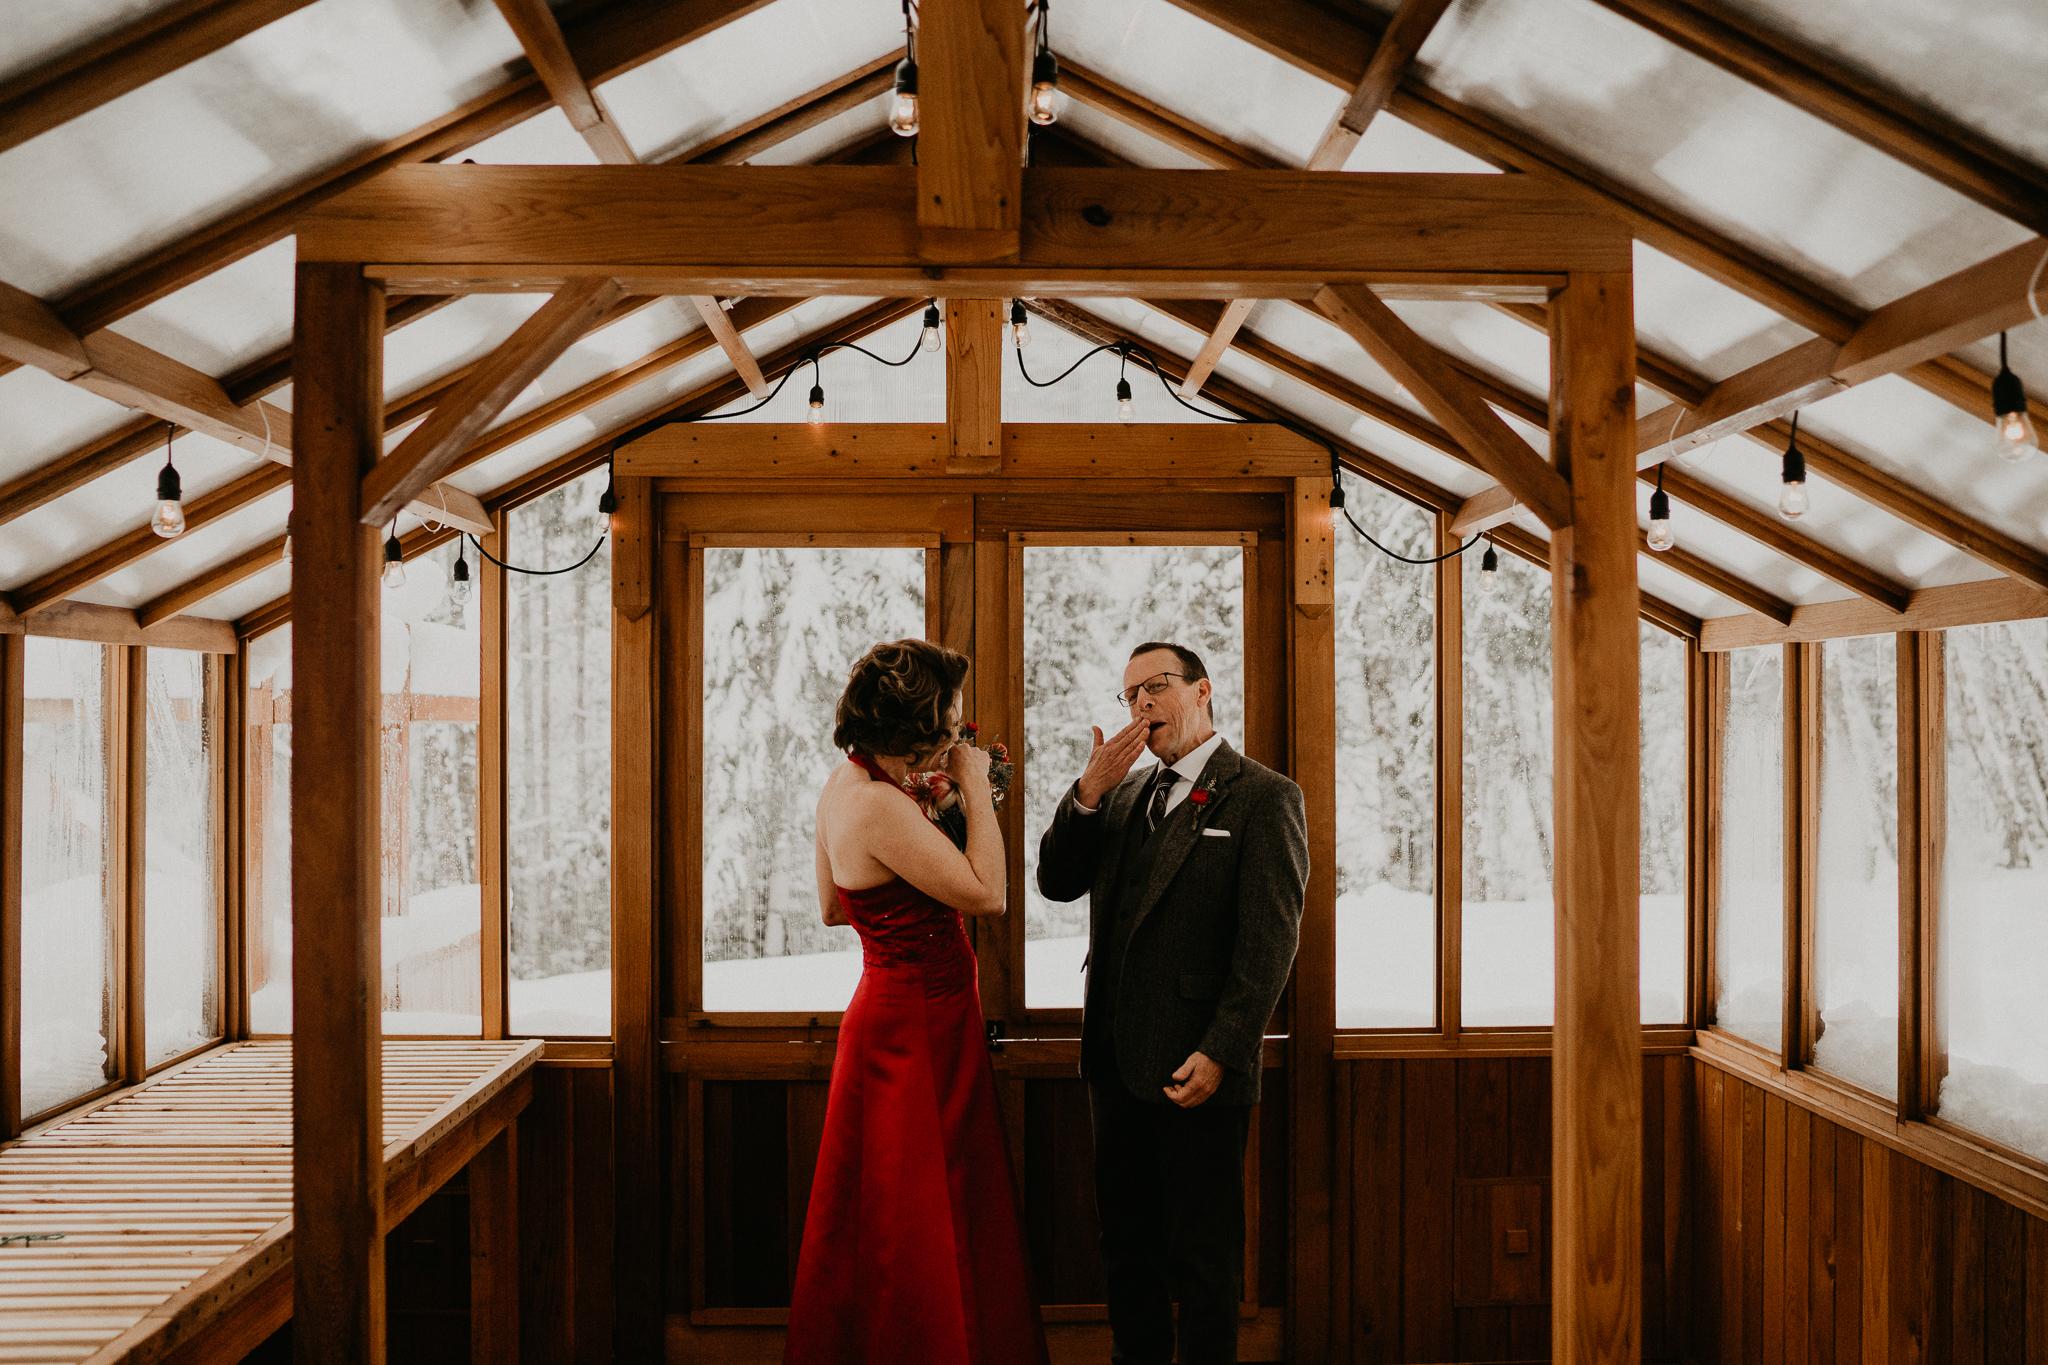 First look cry bride groom adventure couple wedding photographer